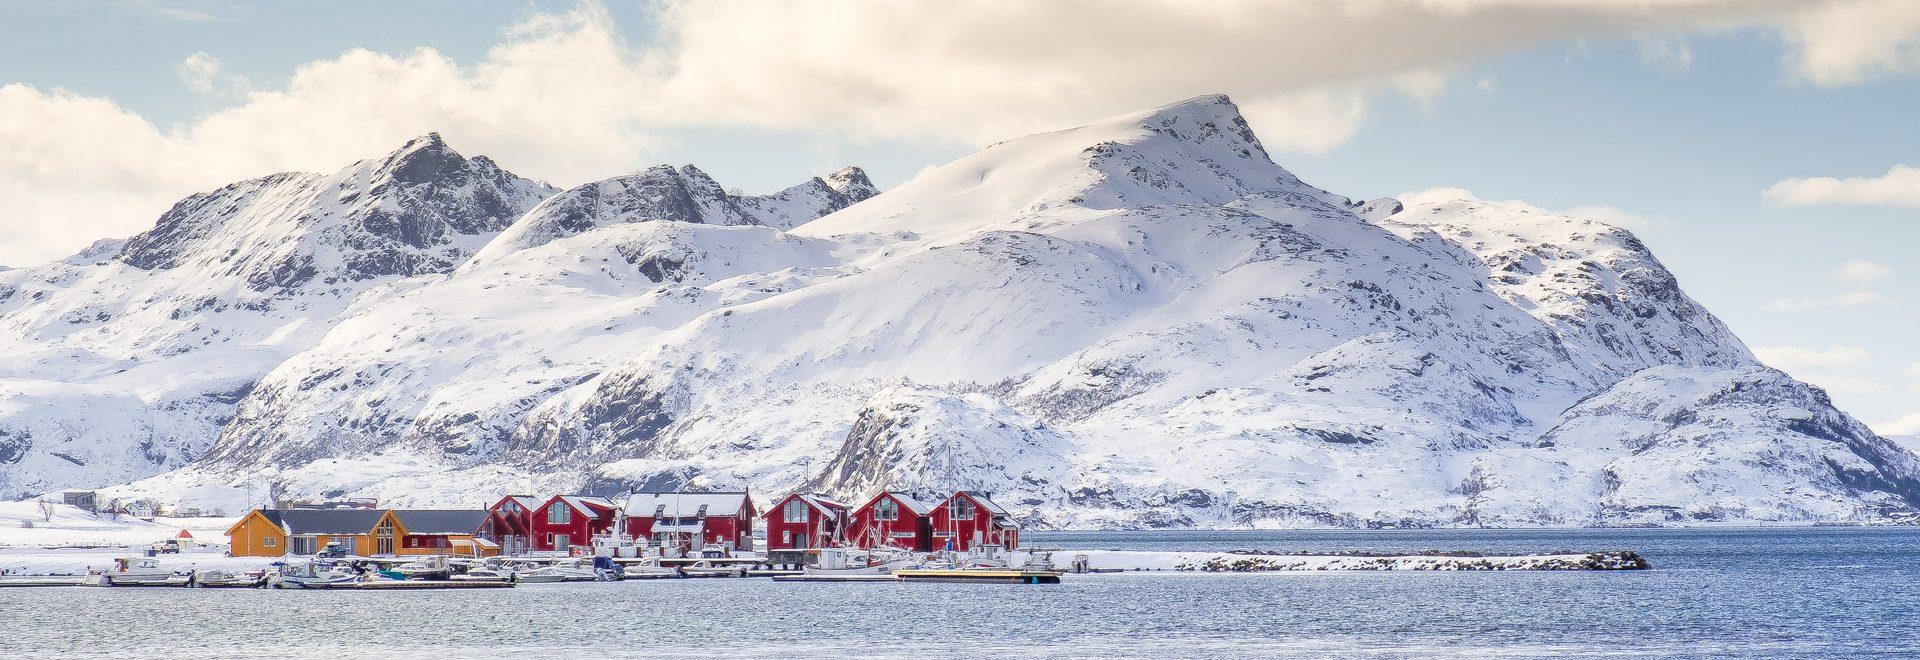 Scialpinismo alle Lofoten (Norvegia)